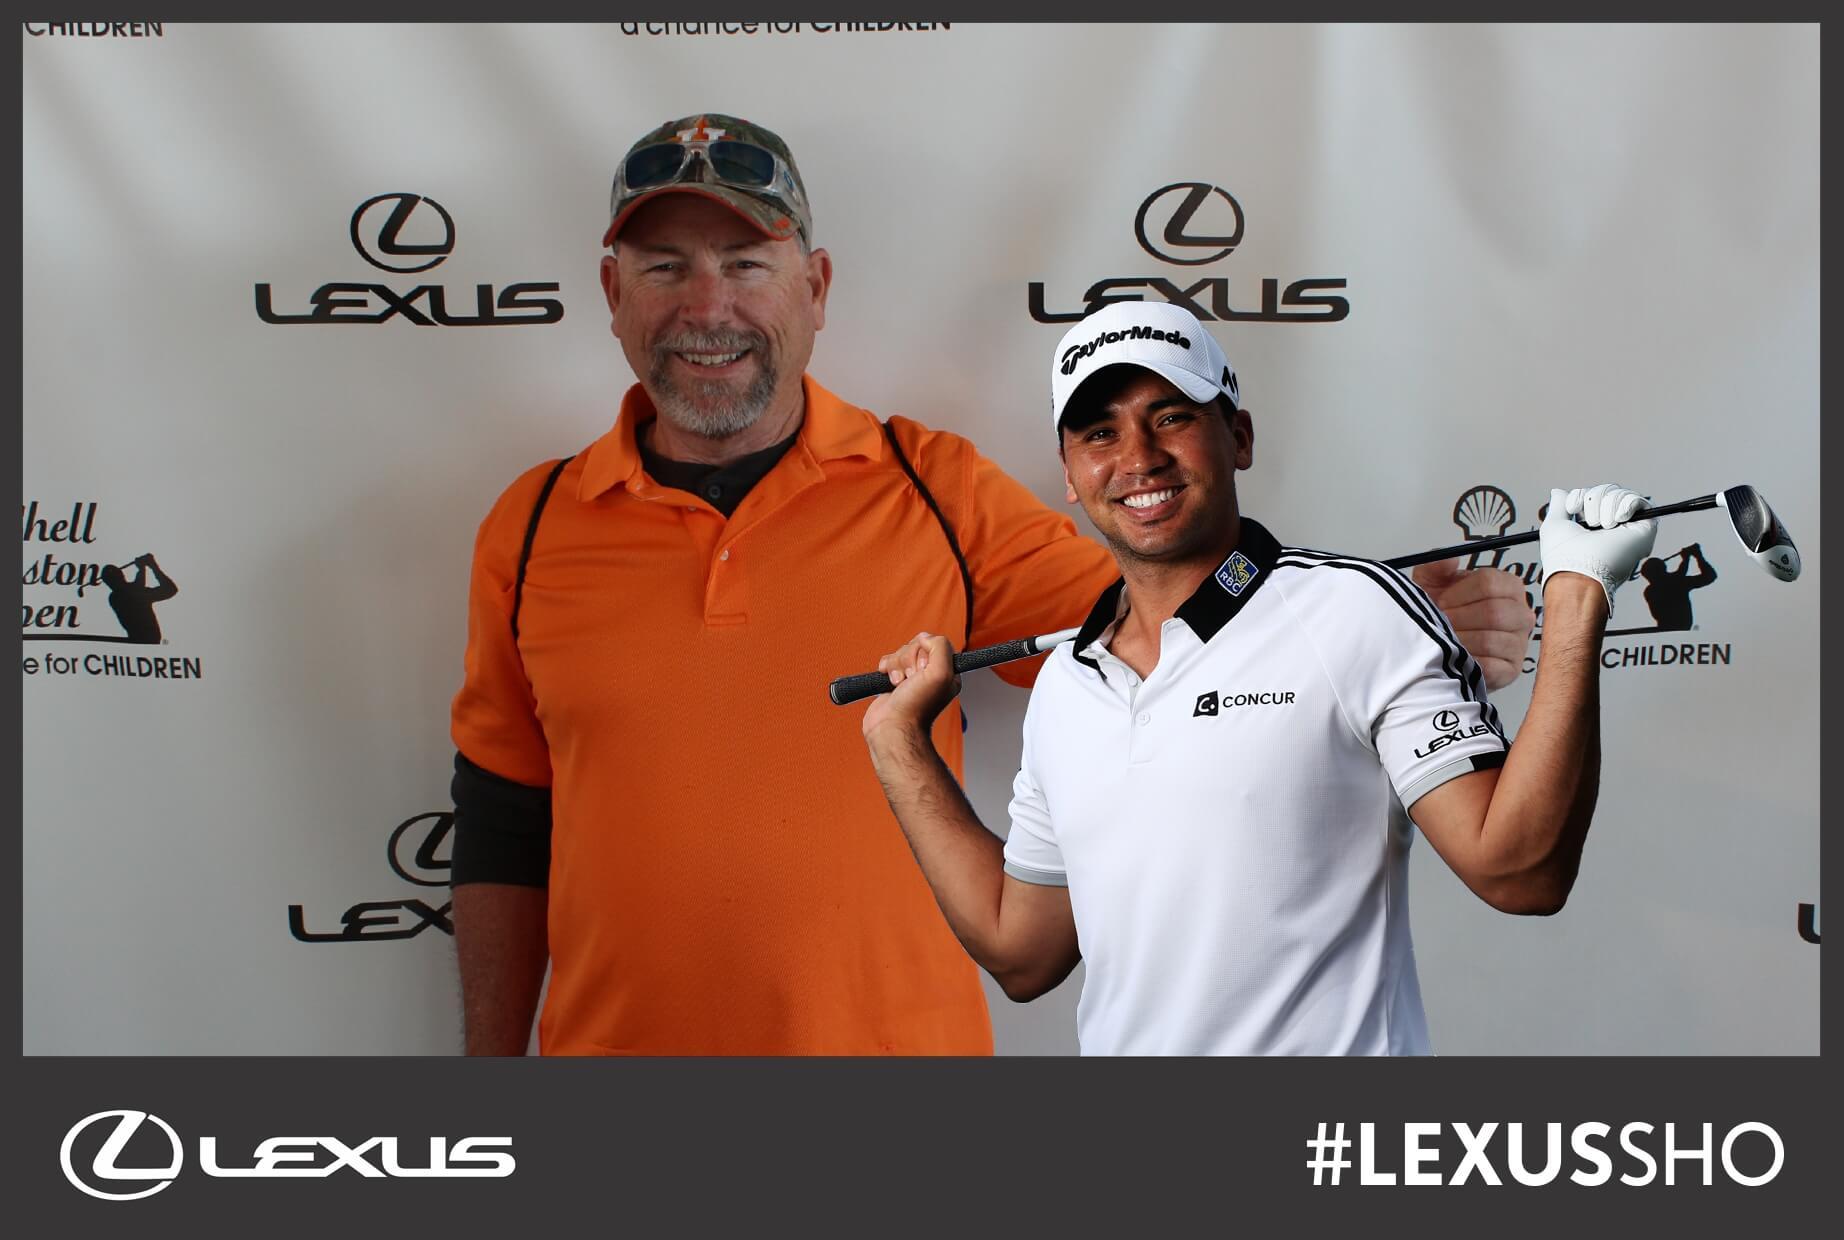 PGA Houston Shell Open photo kiosk